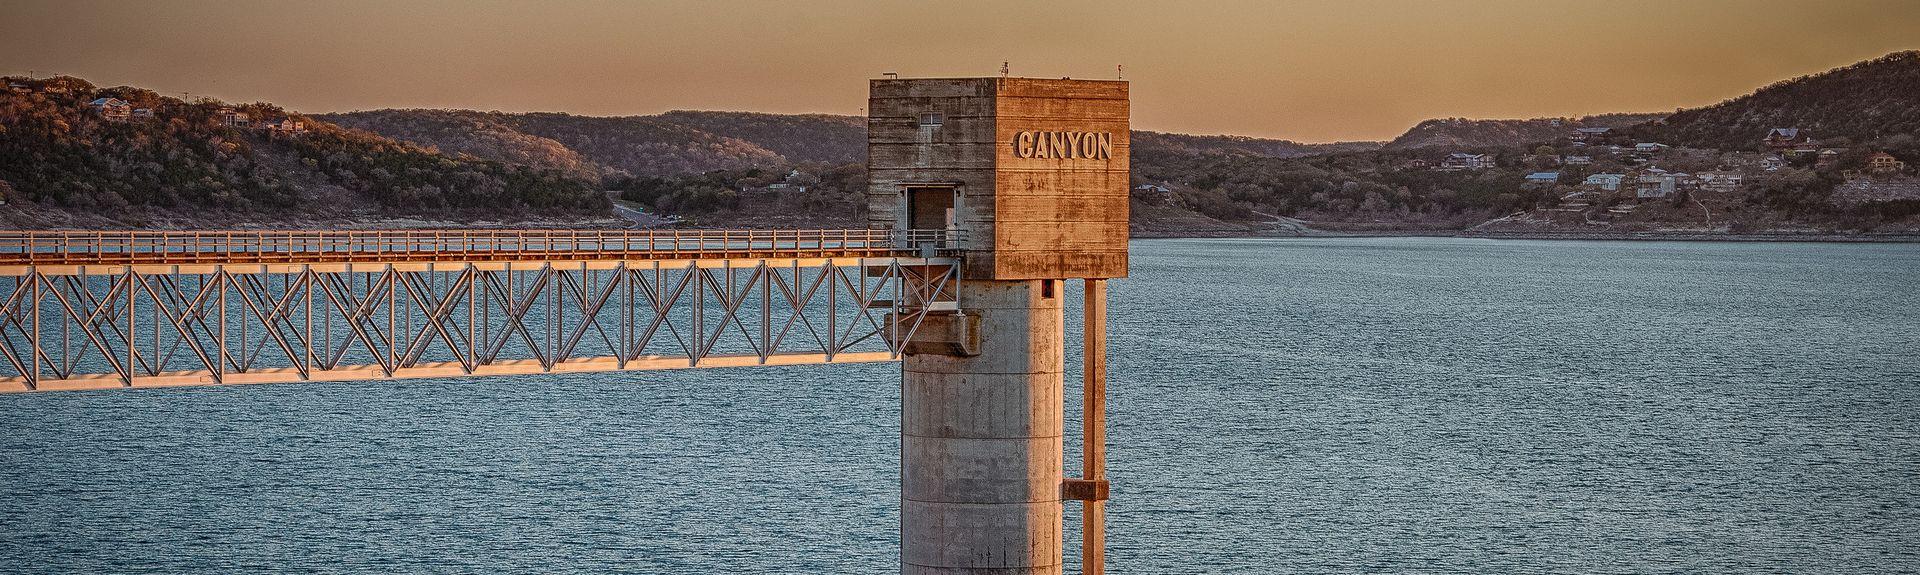 Canyon Lake Marina, Canyon Lake, Texas, United States of America